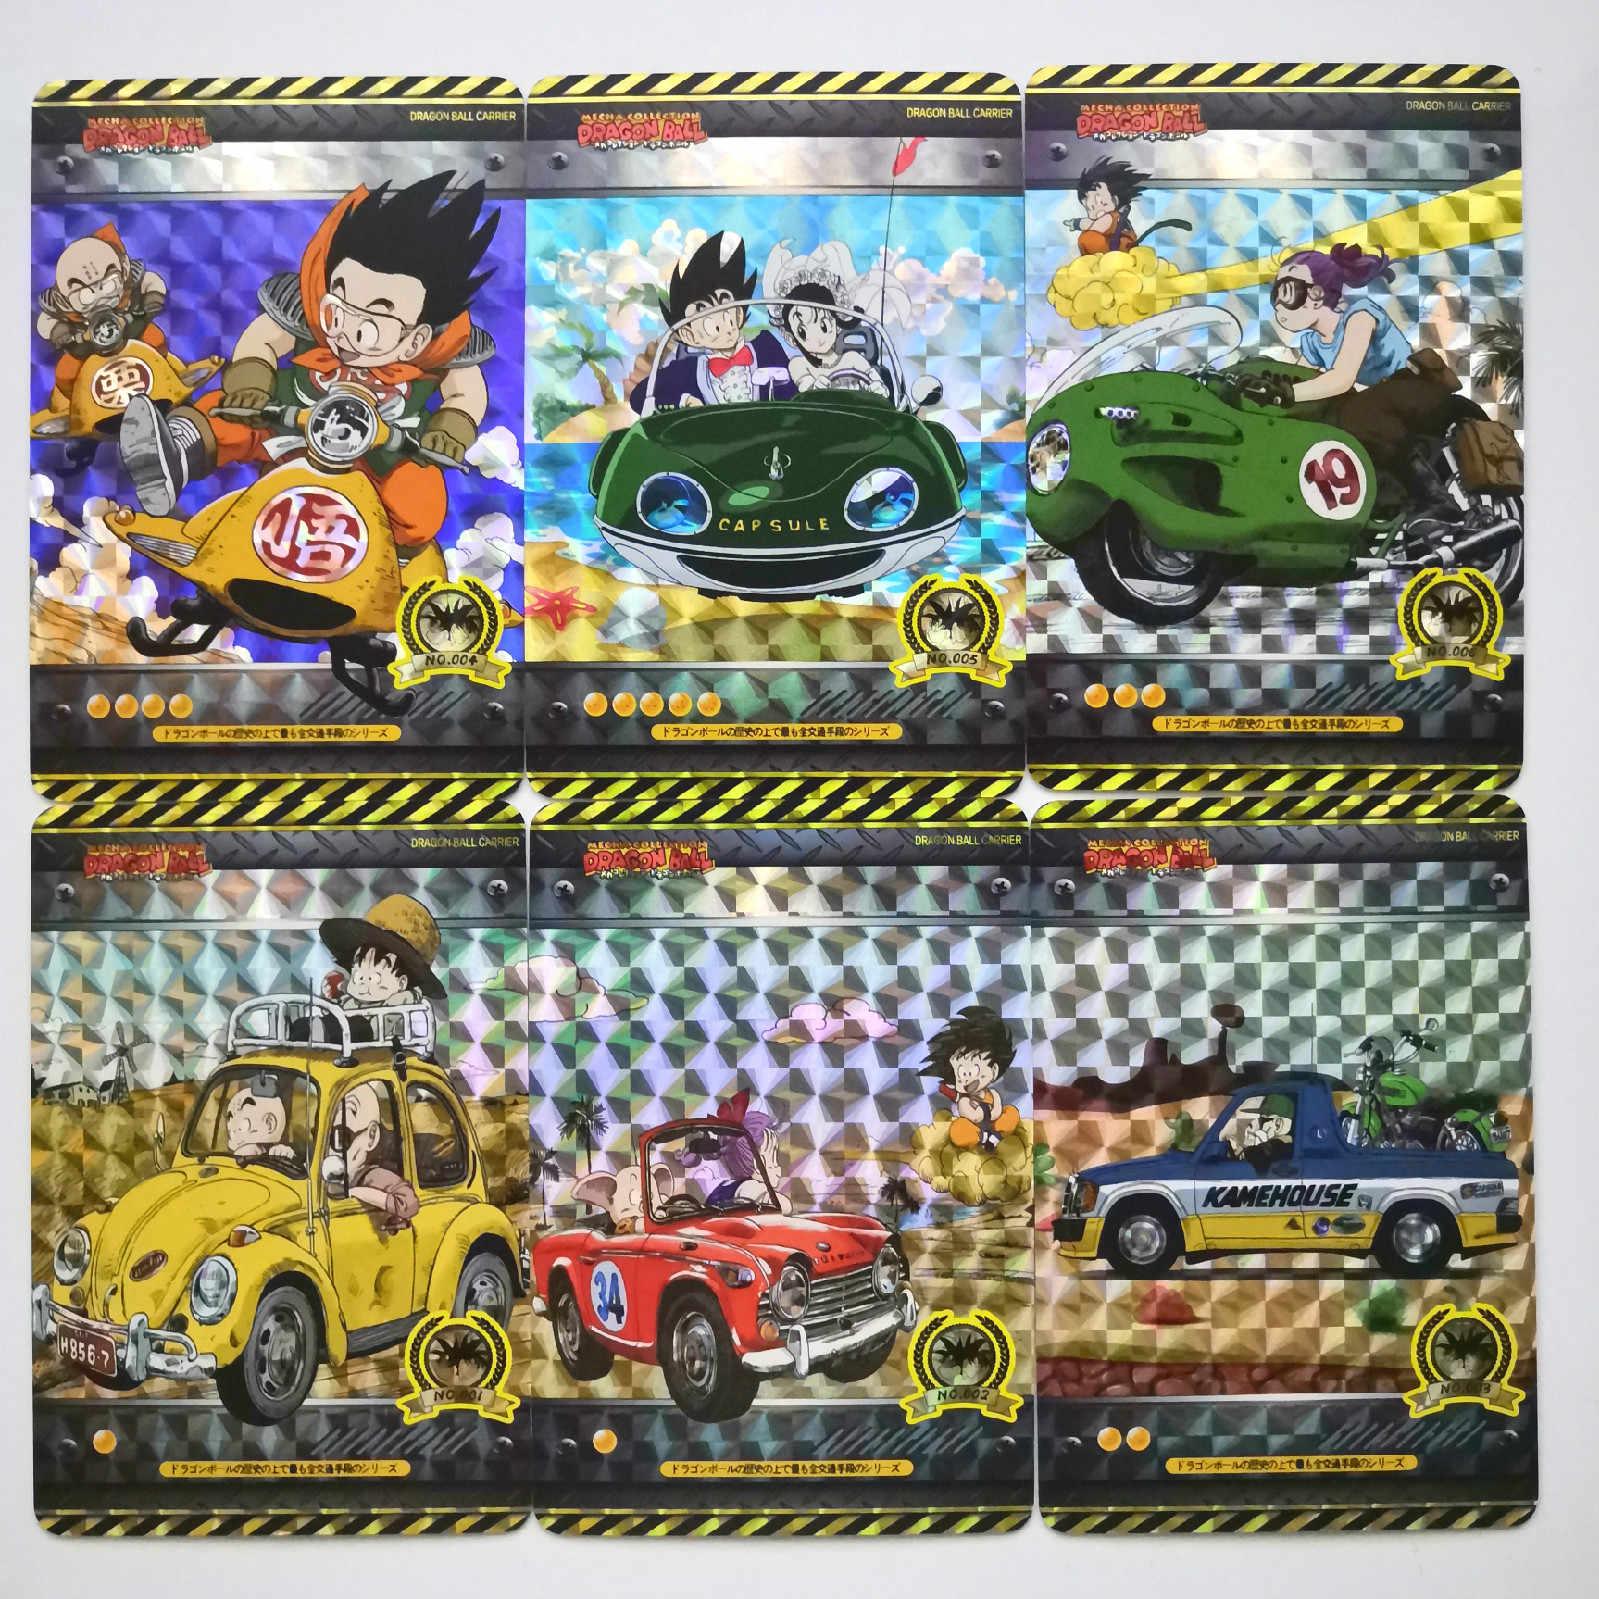 18pcs/set Super Dragon Ball Z First Bullet Heroes Battle Card Goku Vegeta Super Game Collection Cards